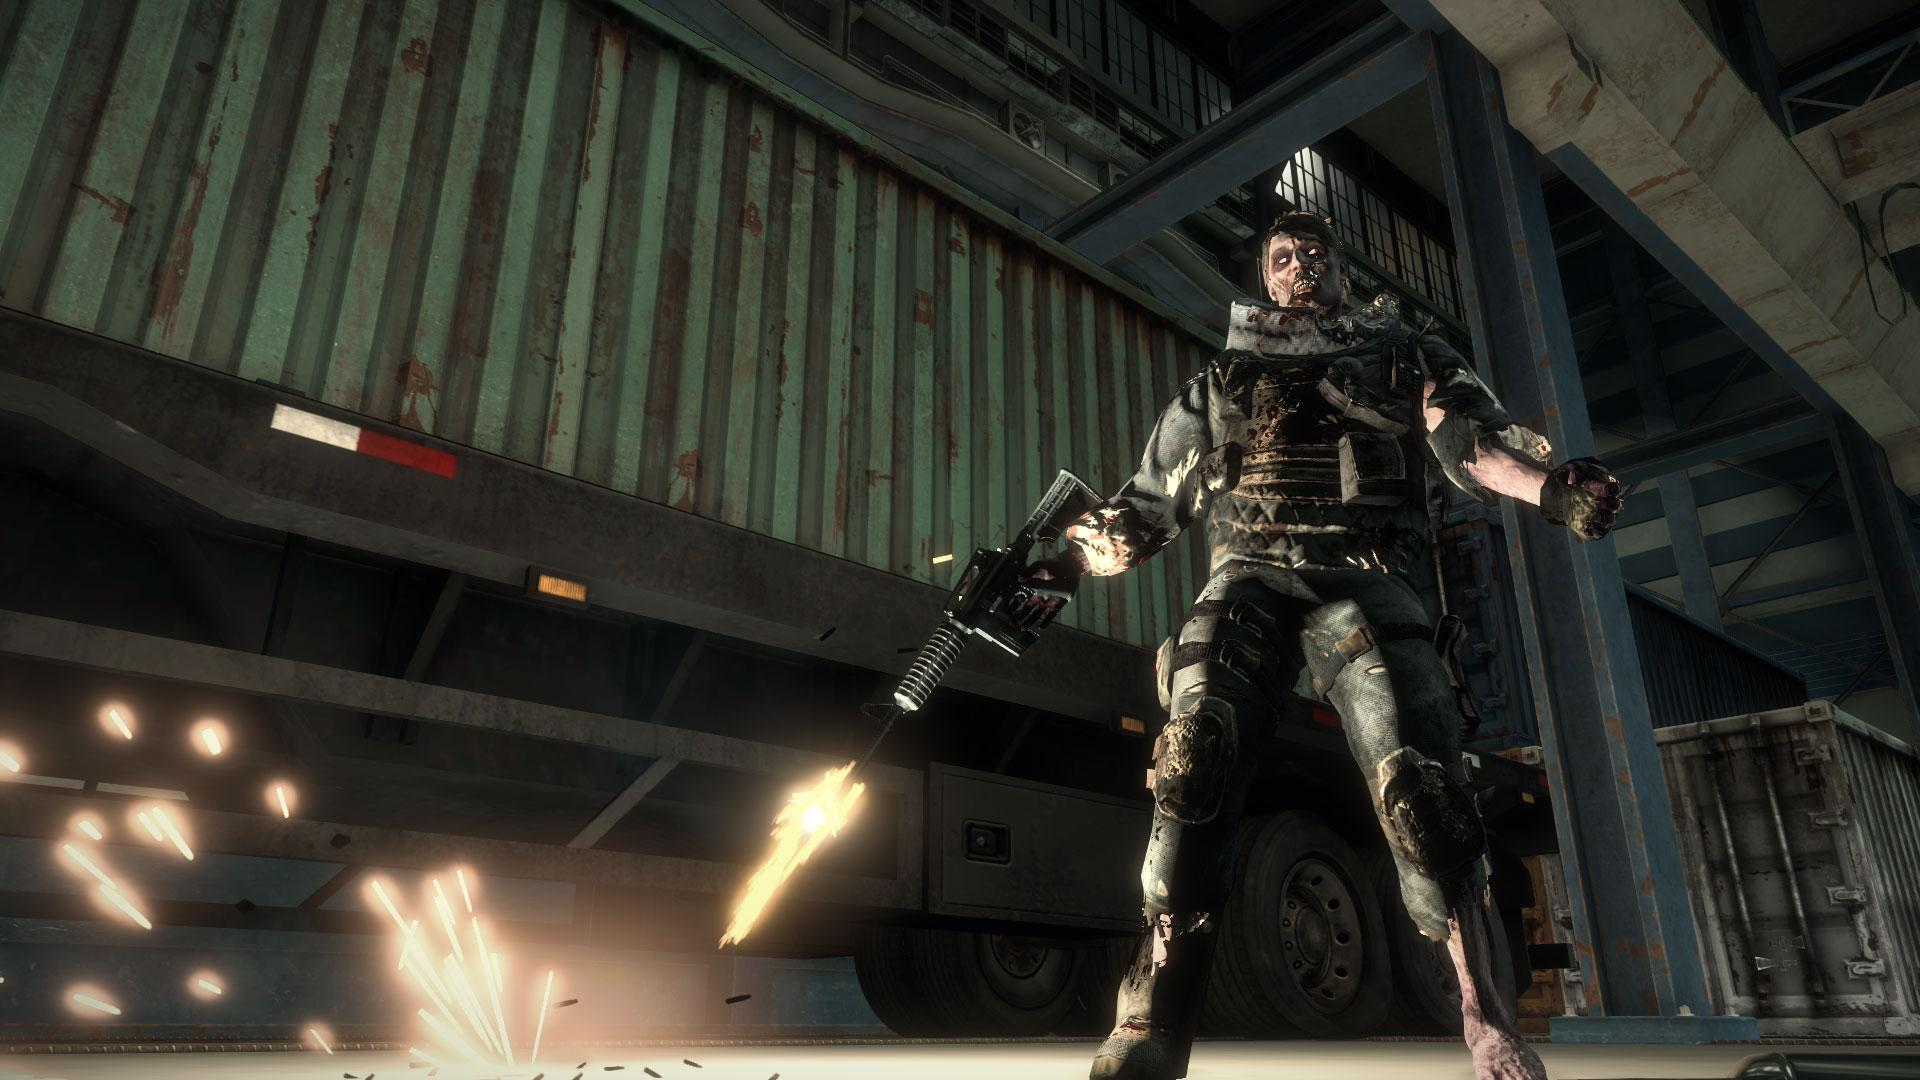 DeadRising3-OperationBrokenEagle Xbox One Editeur 007